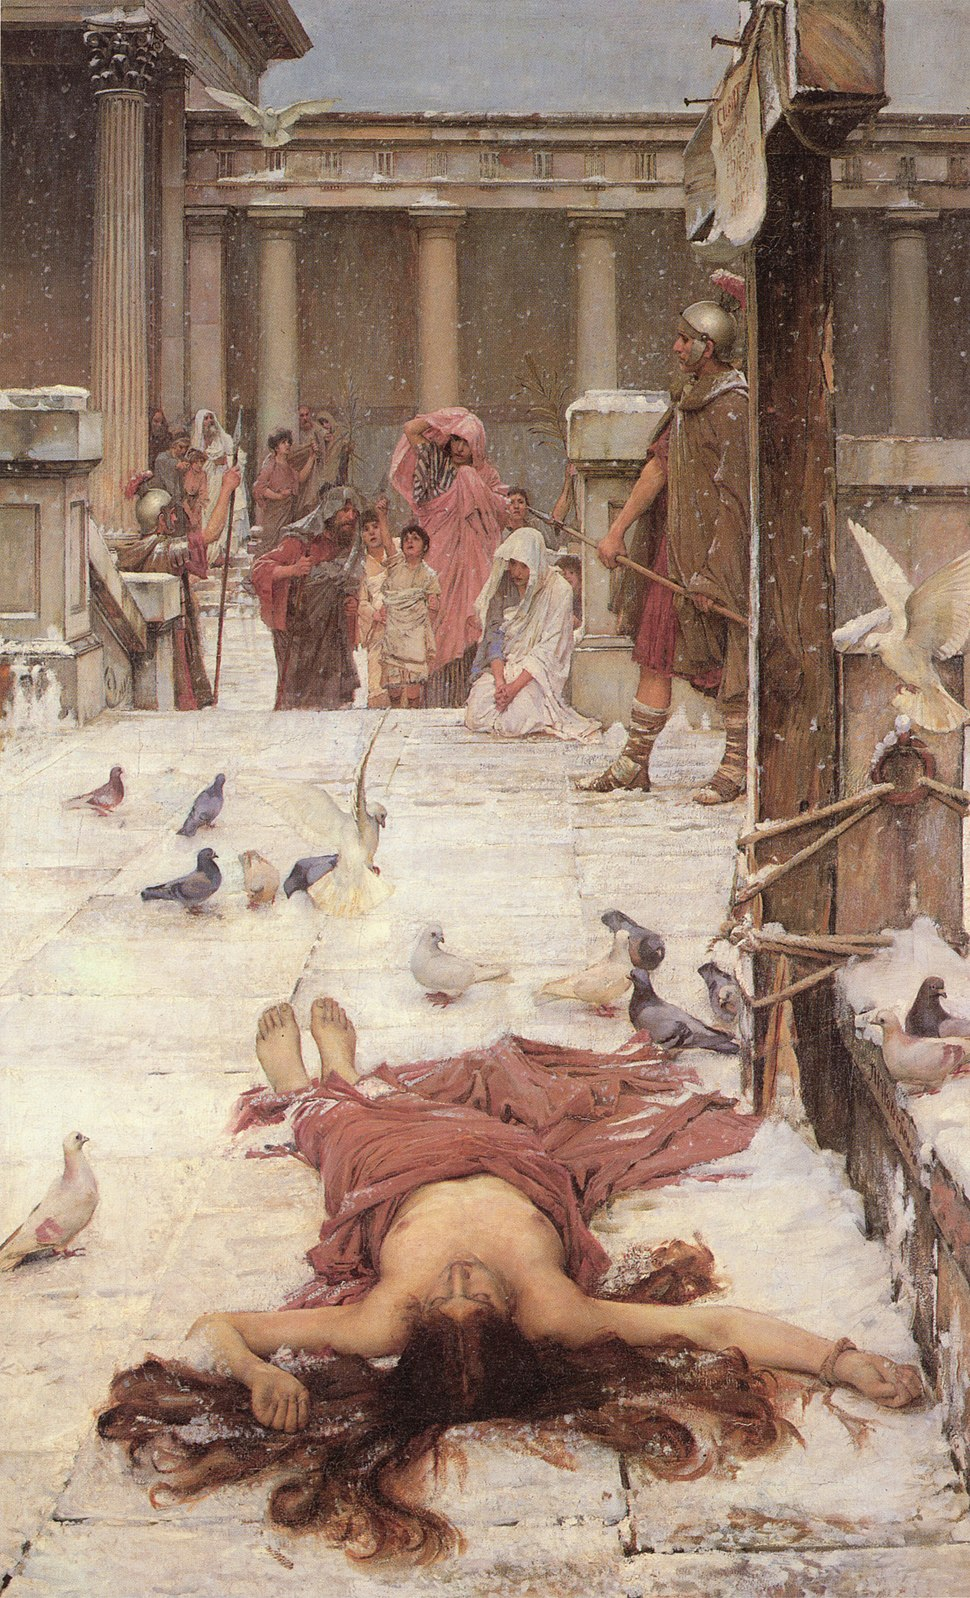 John William Waterhouse - Saint Eulalia - 1885